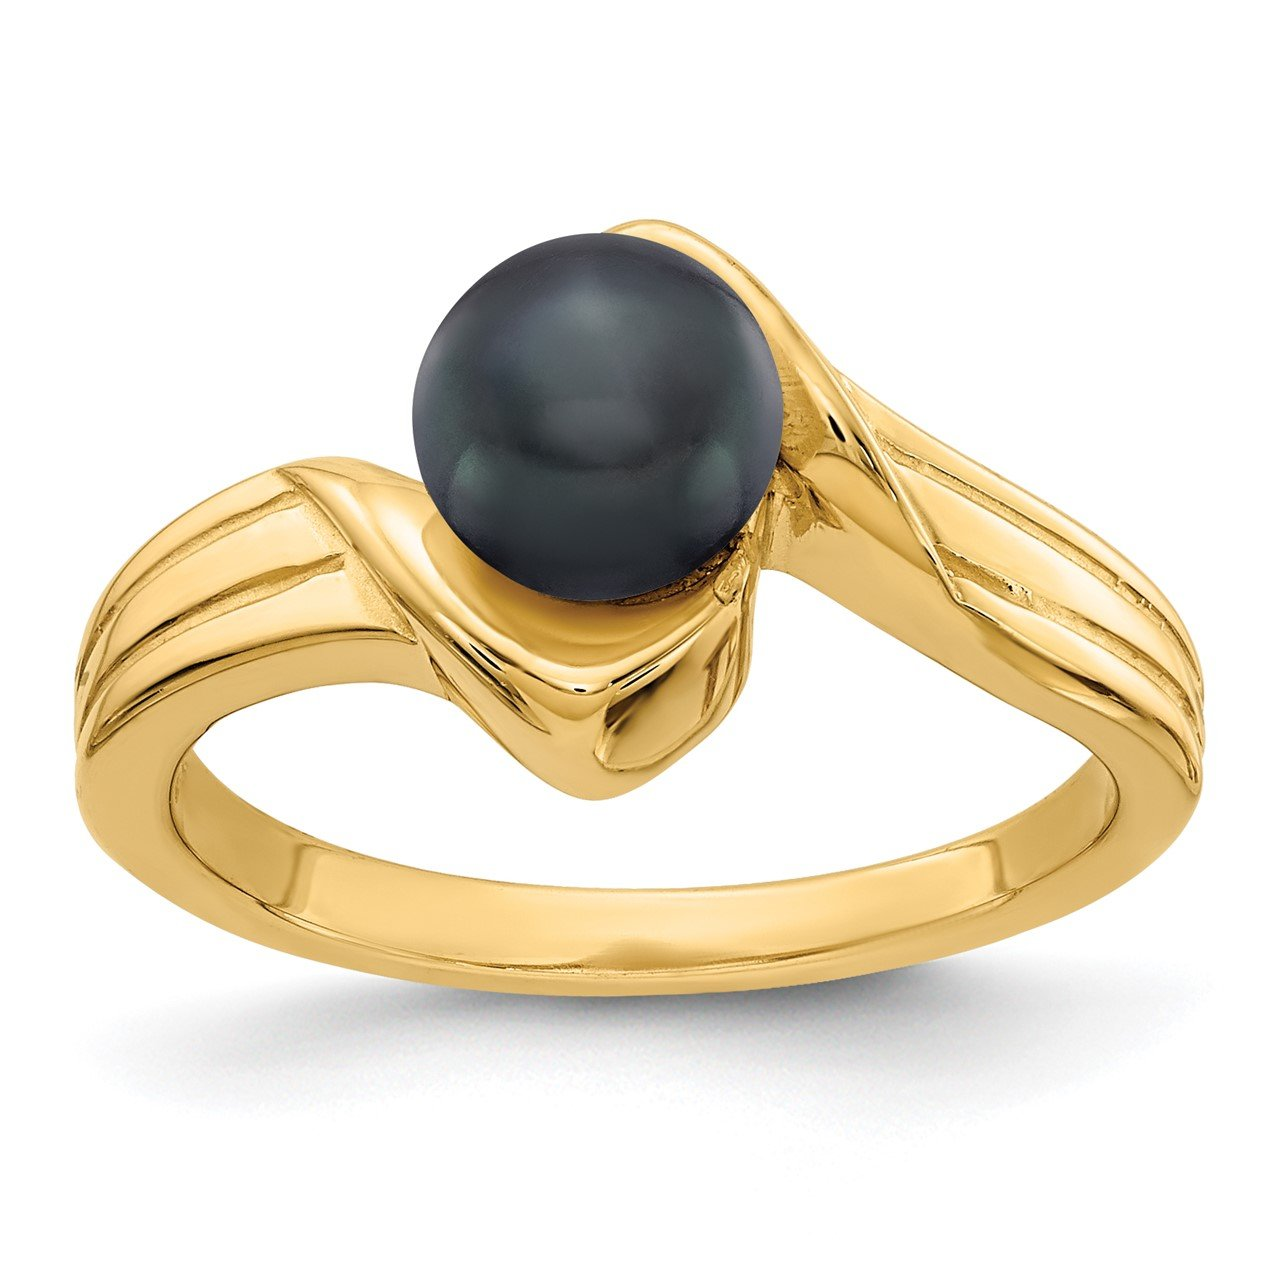 14k 6mm Black FW Cultured Pearl ring